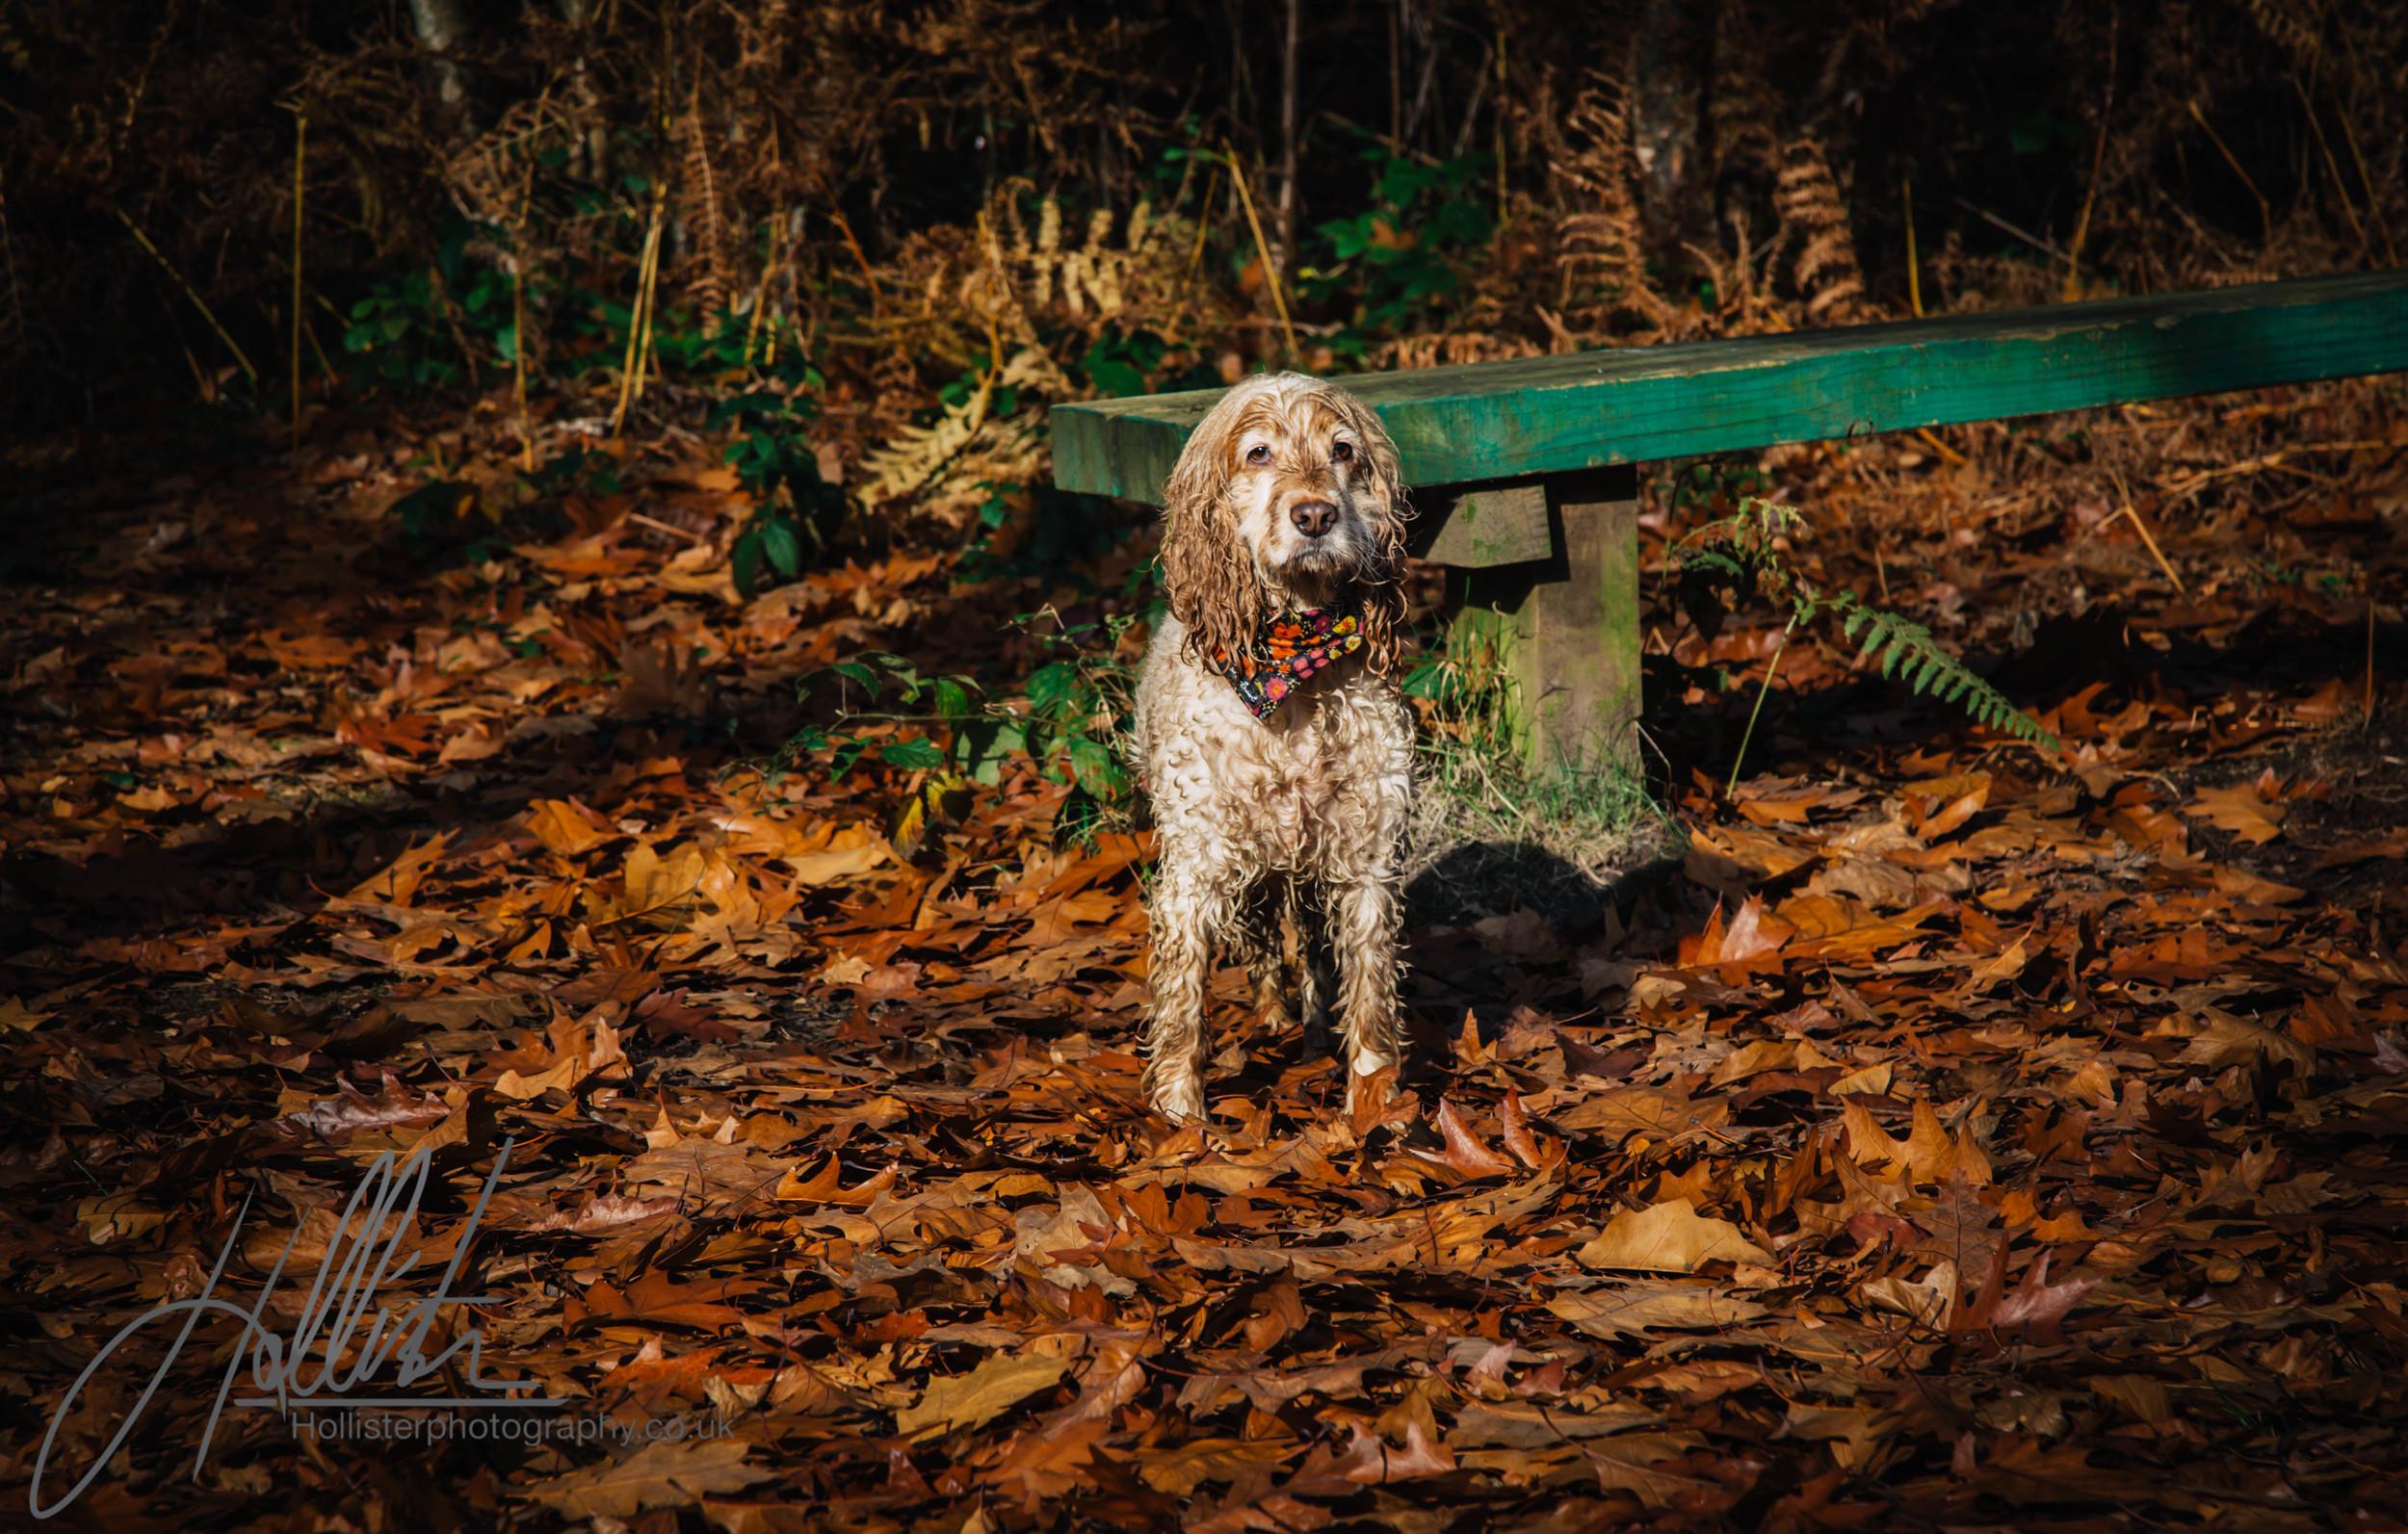 Hollisterphotography ABBY CLOWES WOOD DOG WALK-70.JPG